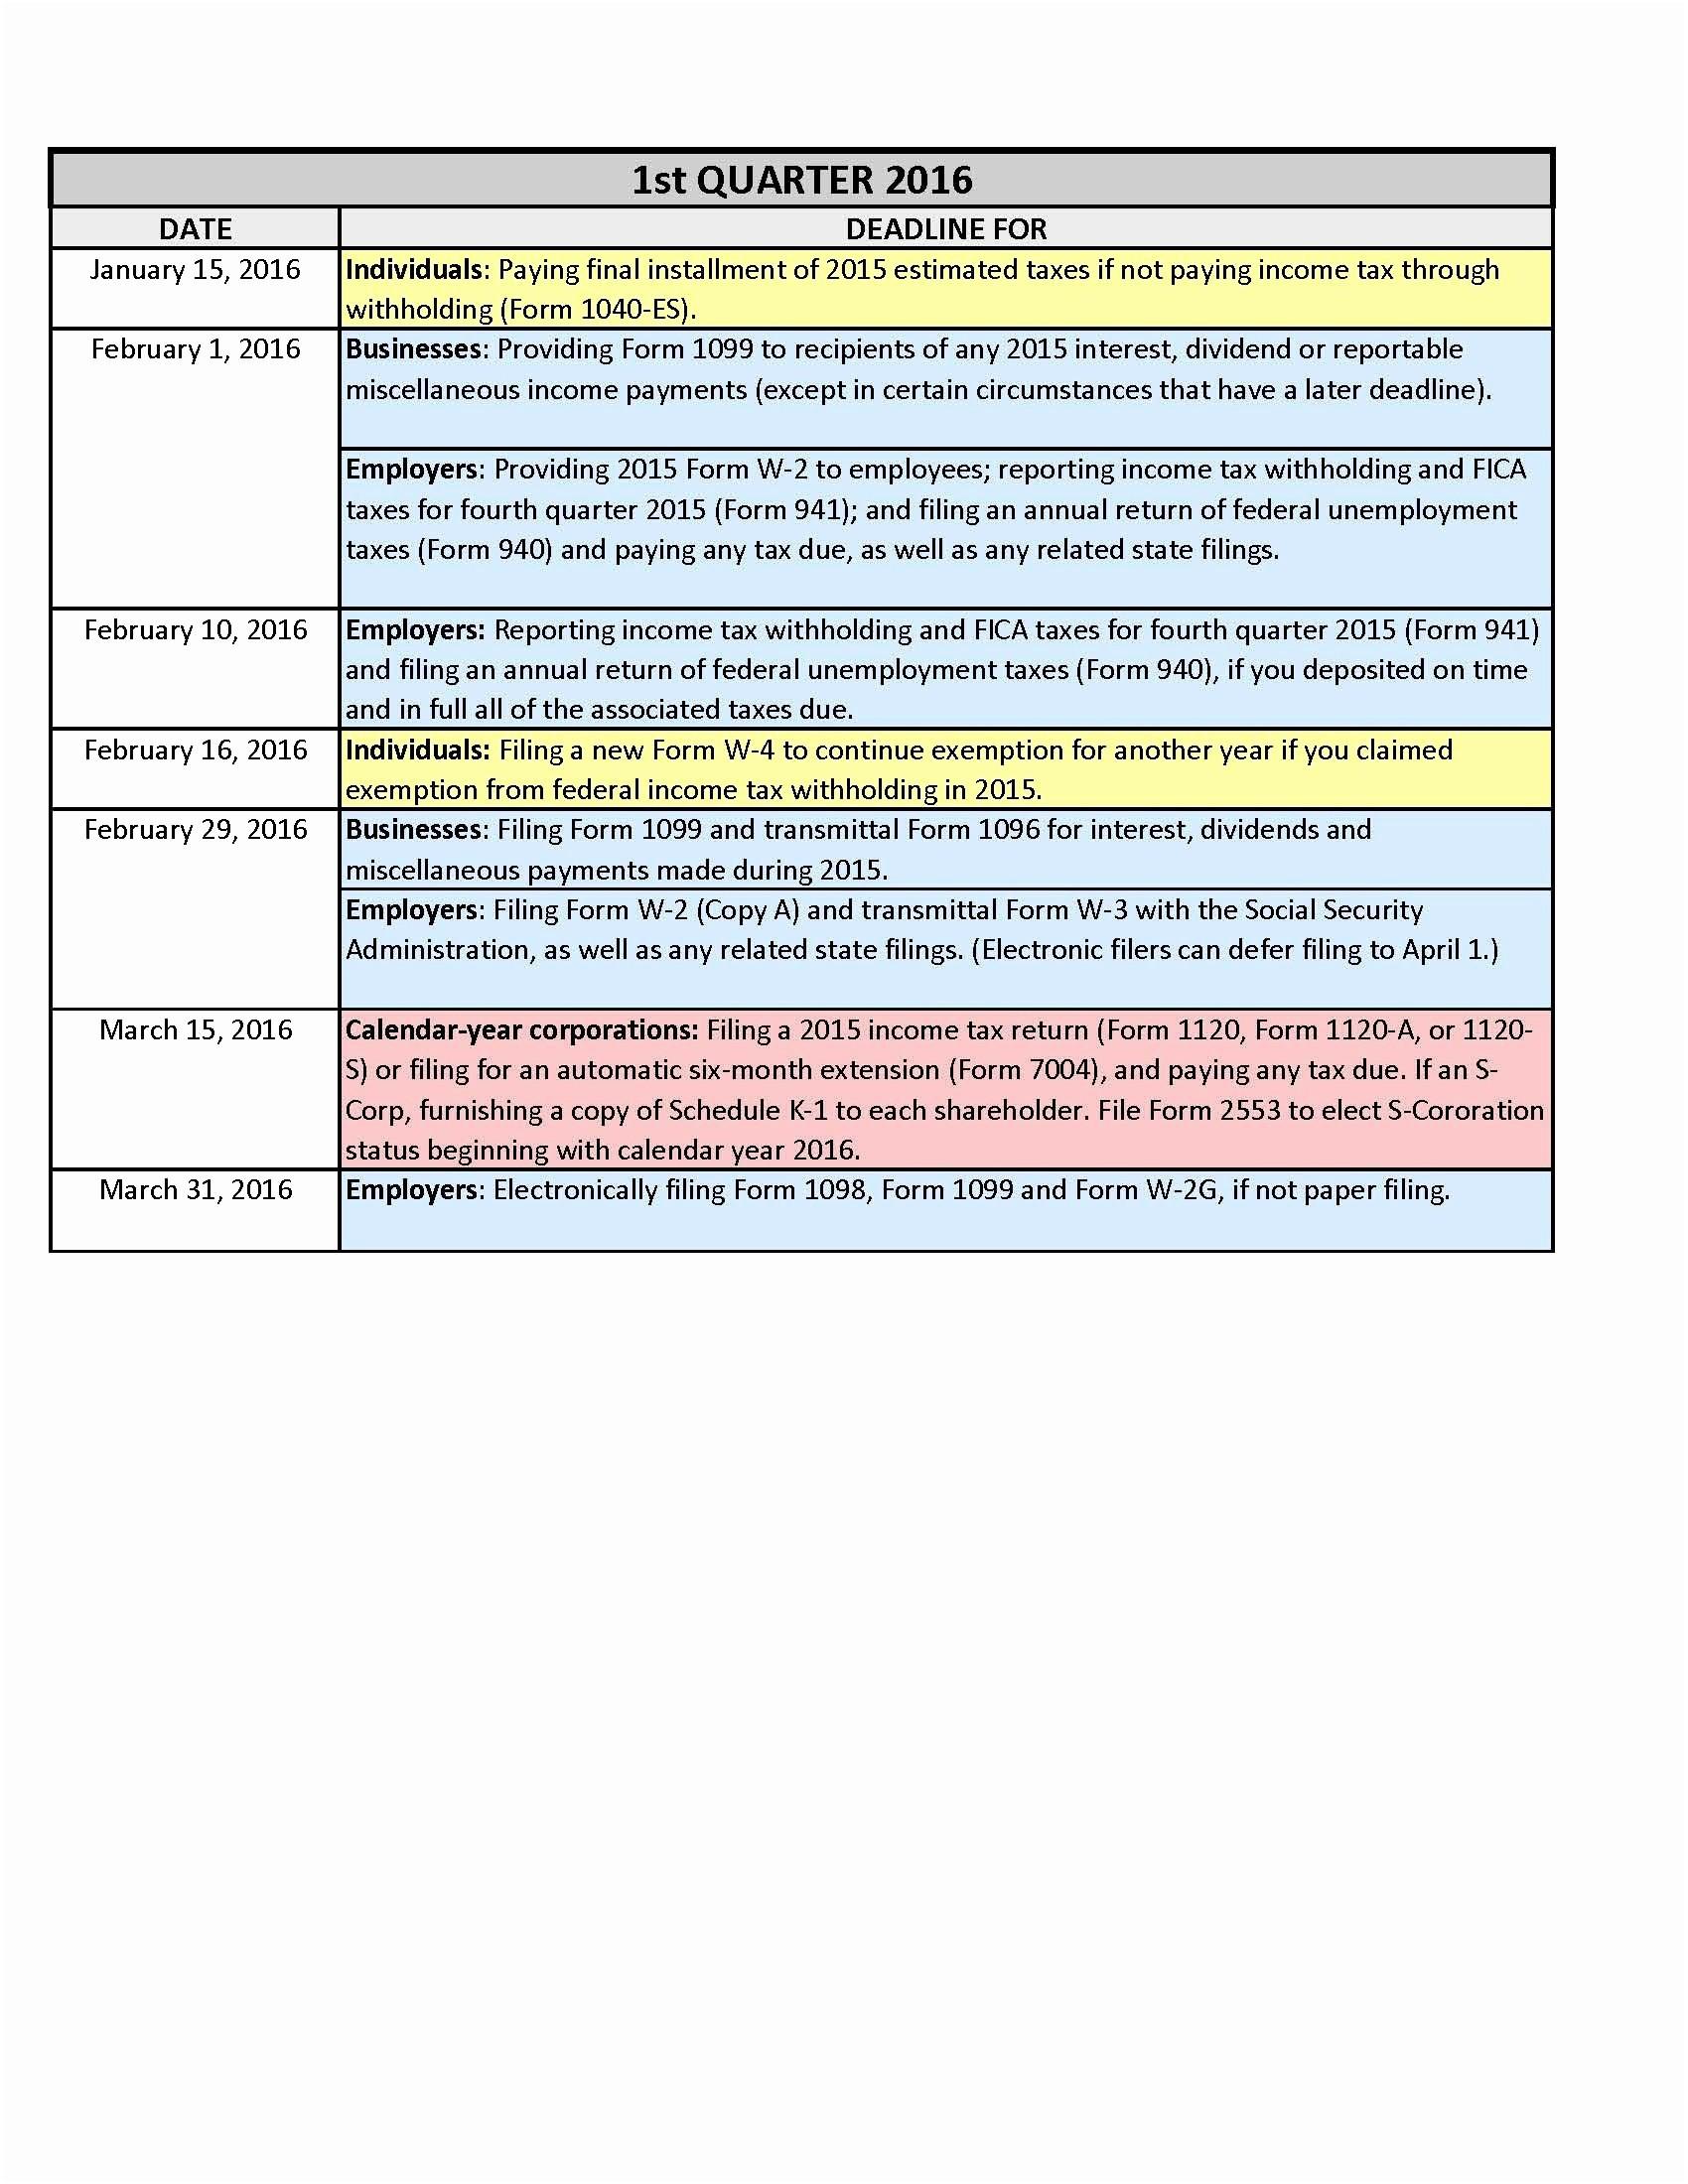 Annual Calendar Template 2014 2015 Printable Calendar Free Printable Tax forms 2016 Luxury Free